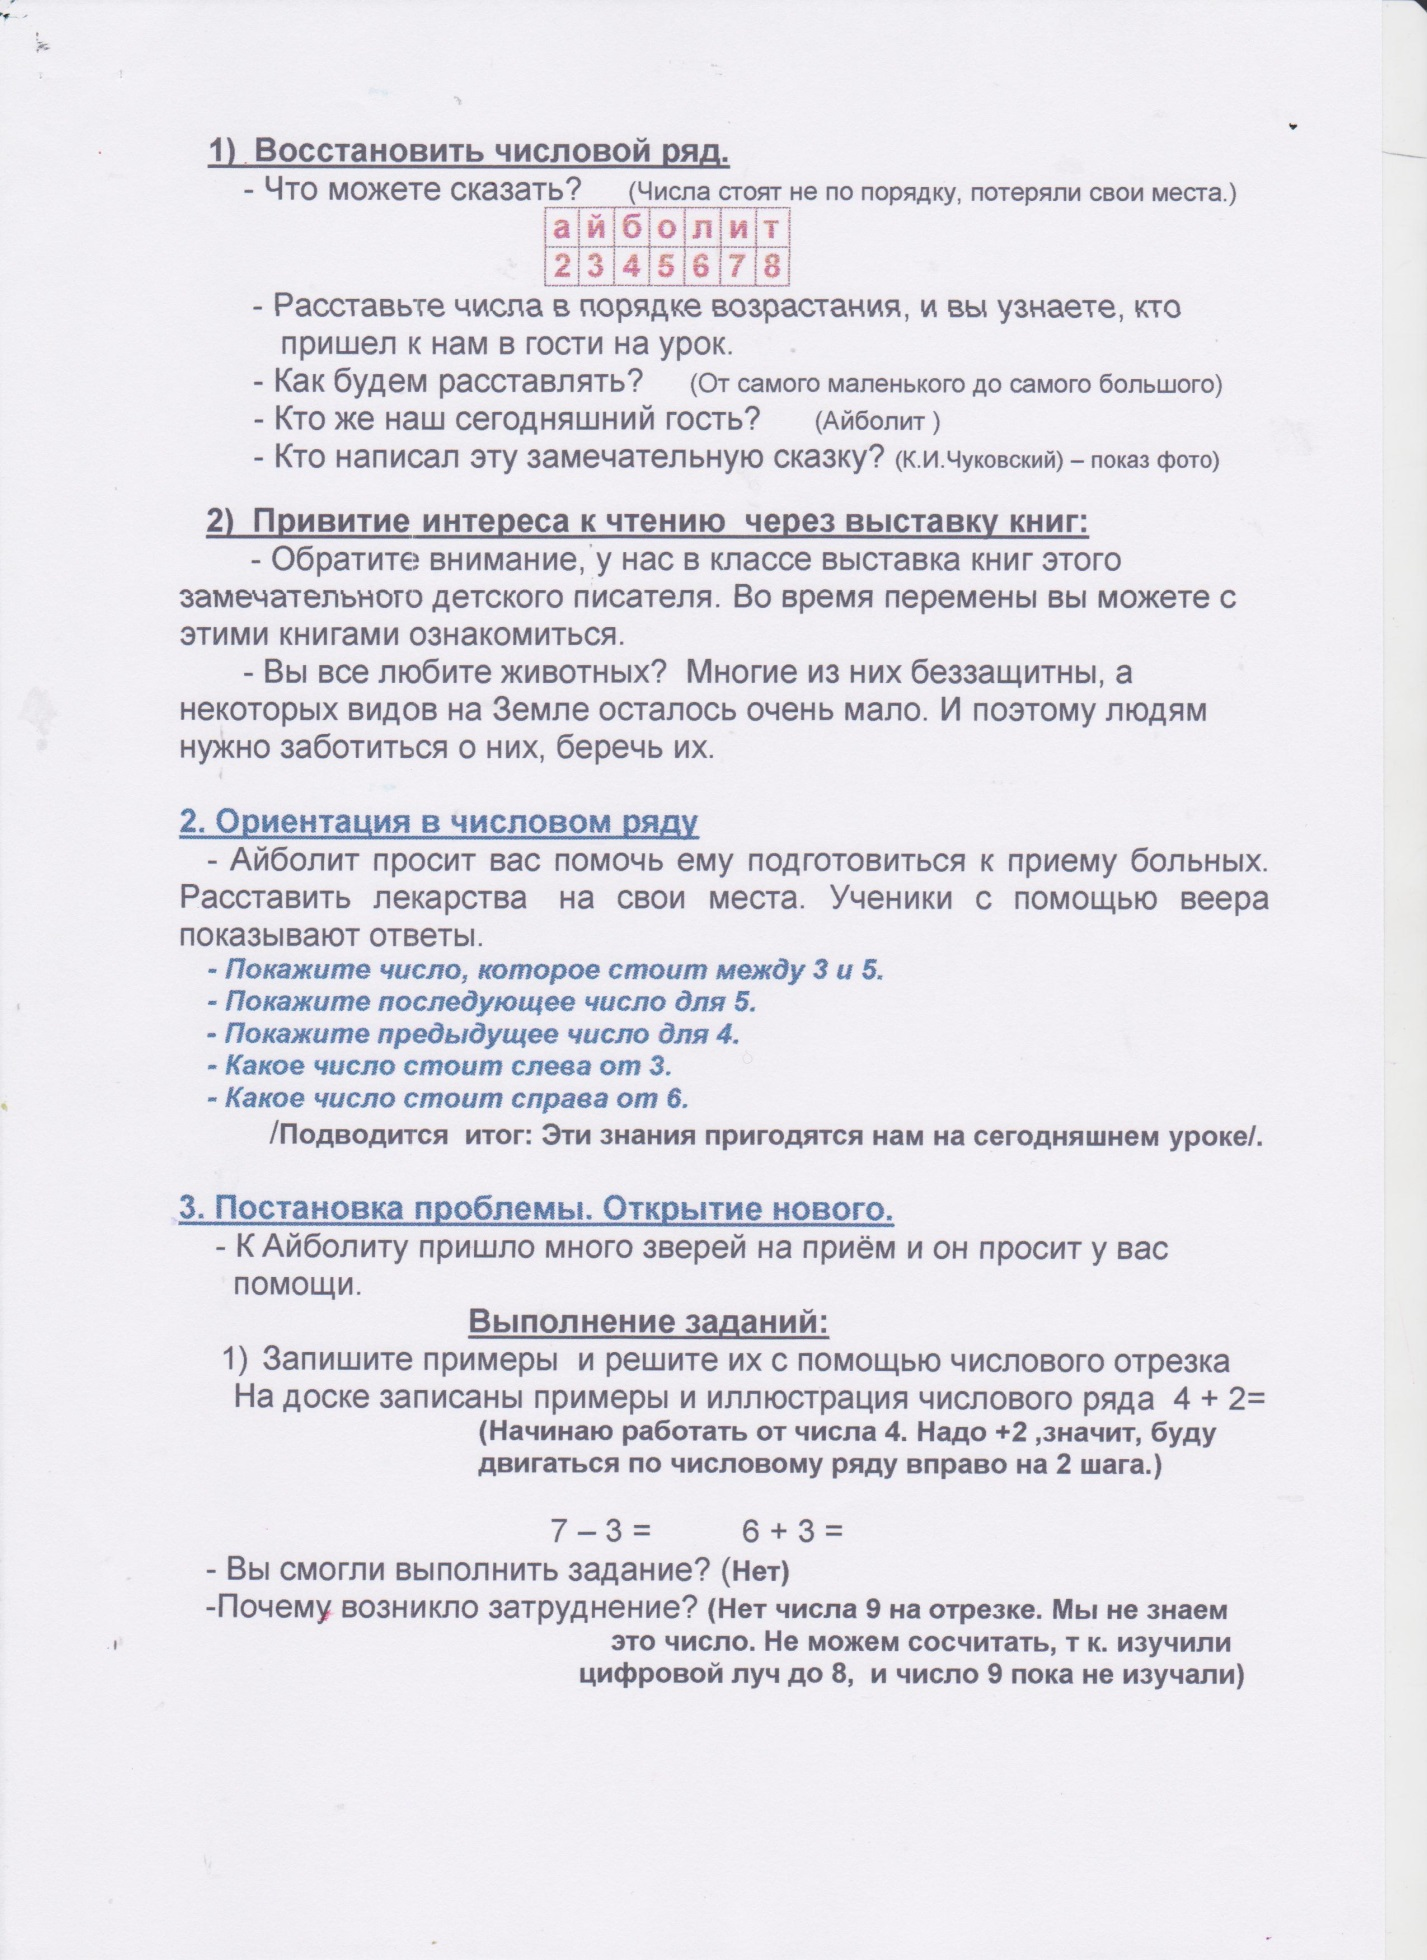 C:\Users\Acer\Desktop\7777777777\урок число 9\2 001.jpg